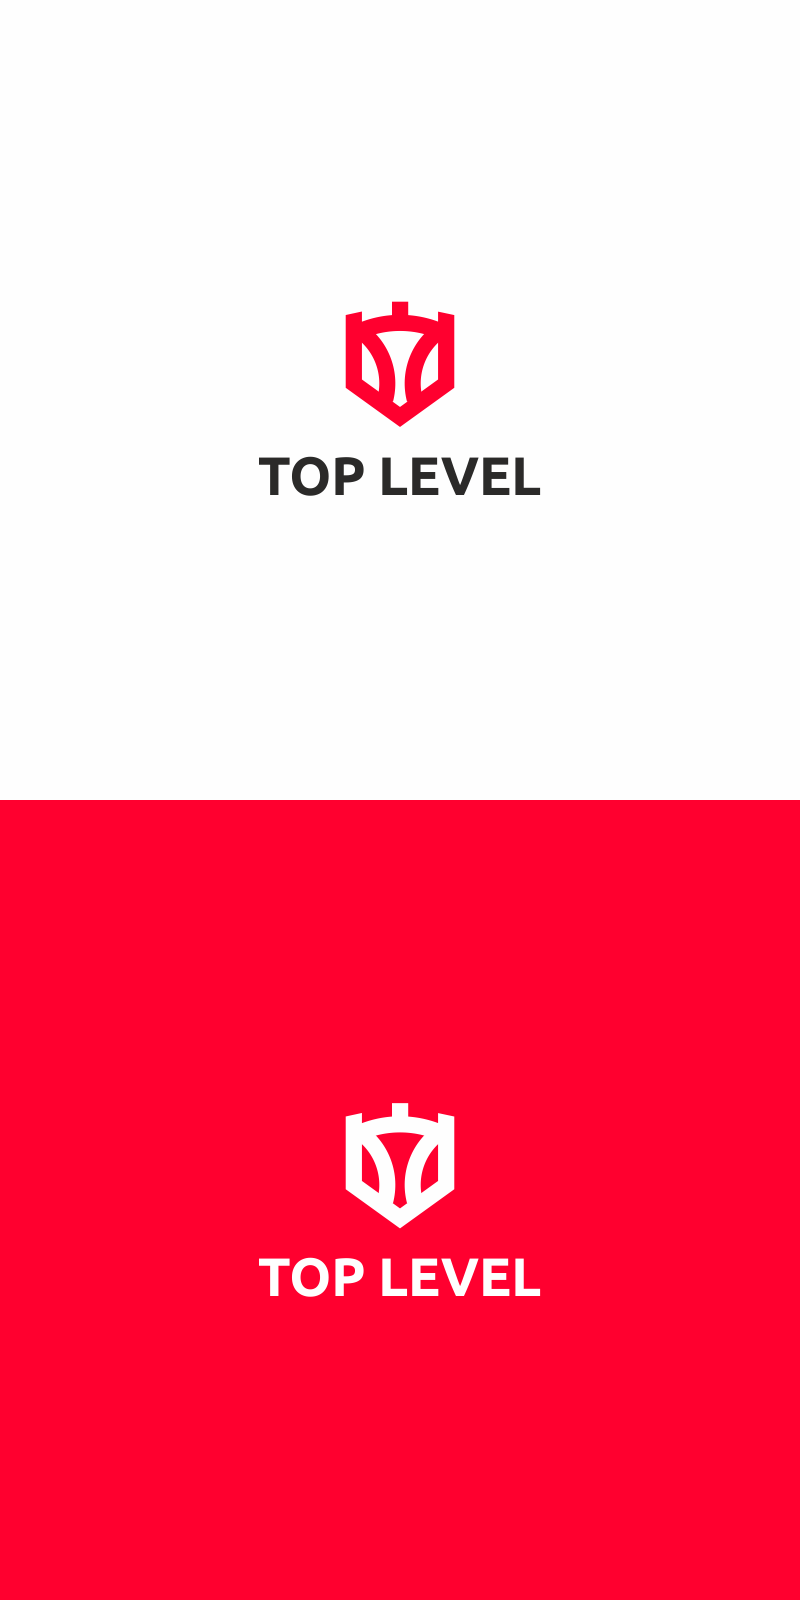 Разработка логотипа для тюнинг ателье фото f_9545f4a989ce81c7.png